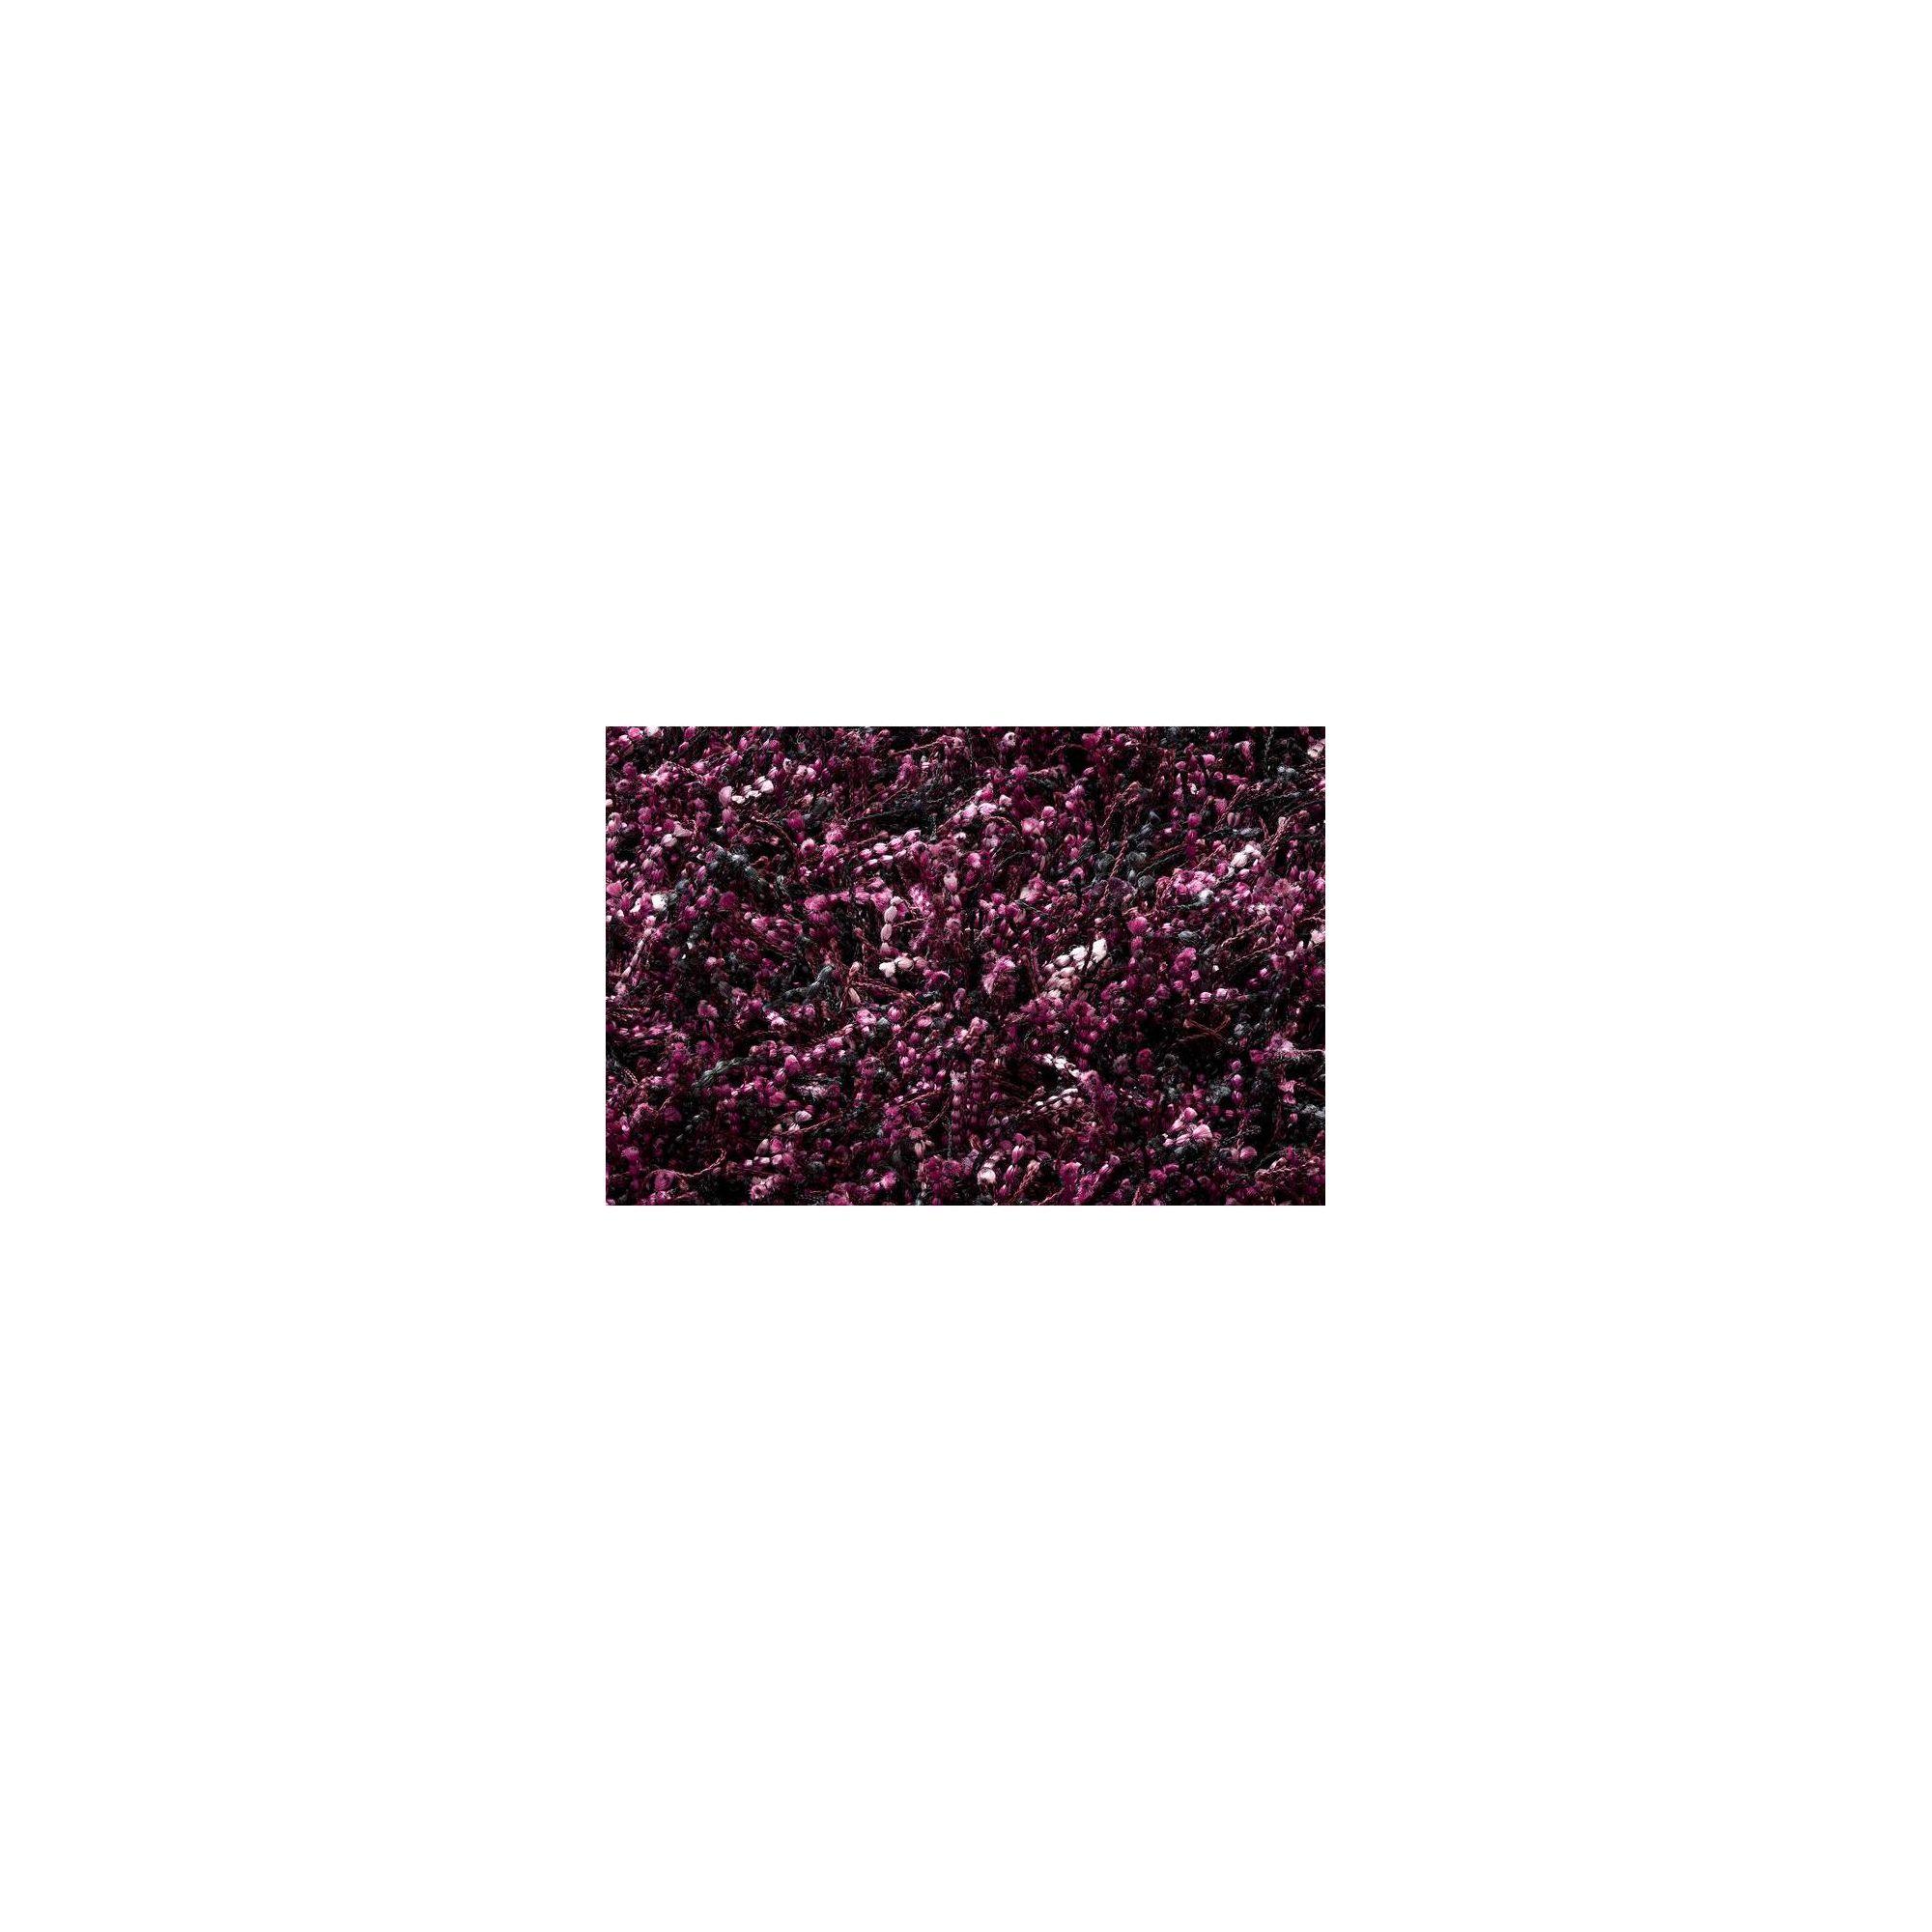 Linie Design Sprinkle Purple Shag Rug - 230cm x 160cm at Tesco Direct